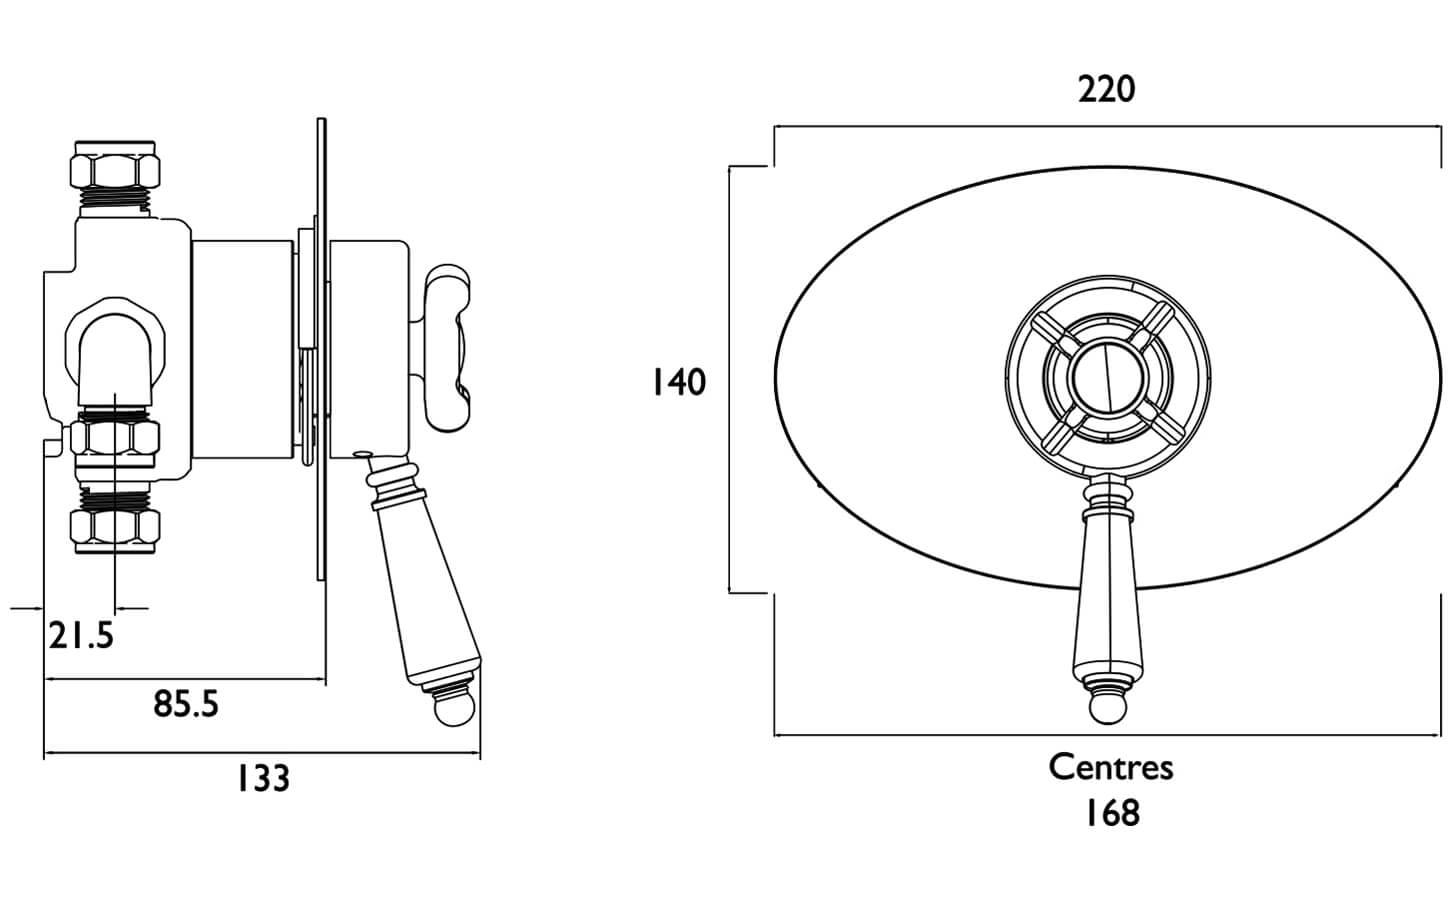 Bristan 1901 Thermostatic Recessed Dual Control Shower Valve